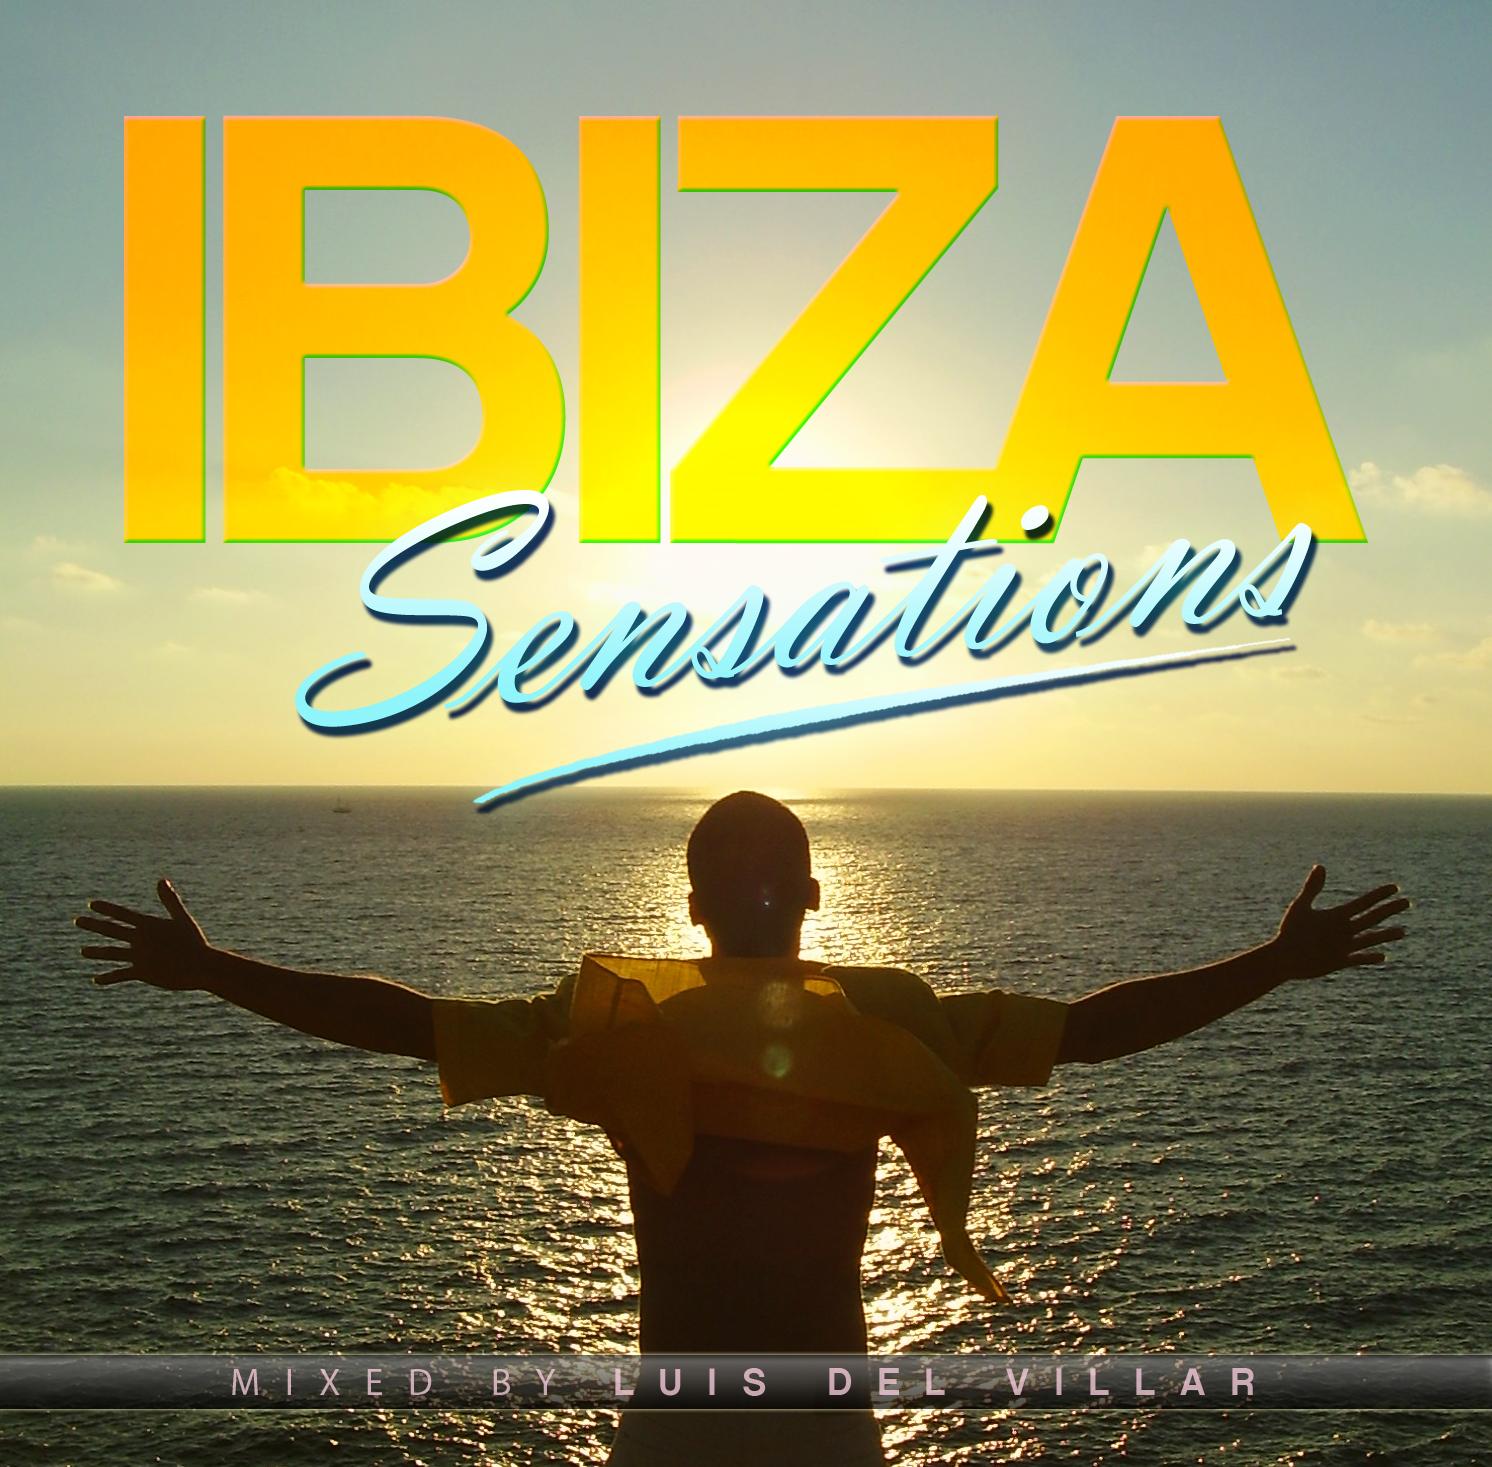 Artwork for Ibiza Sensations 84